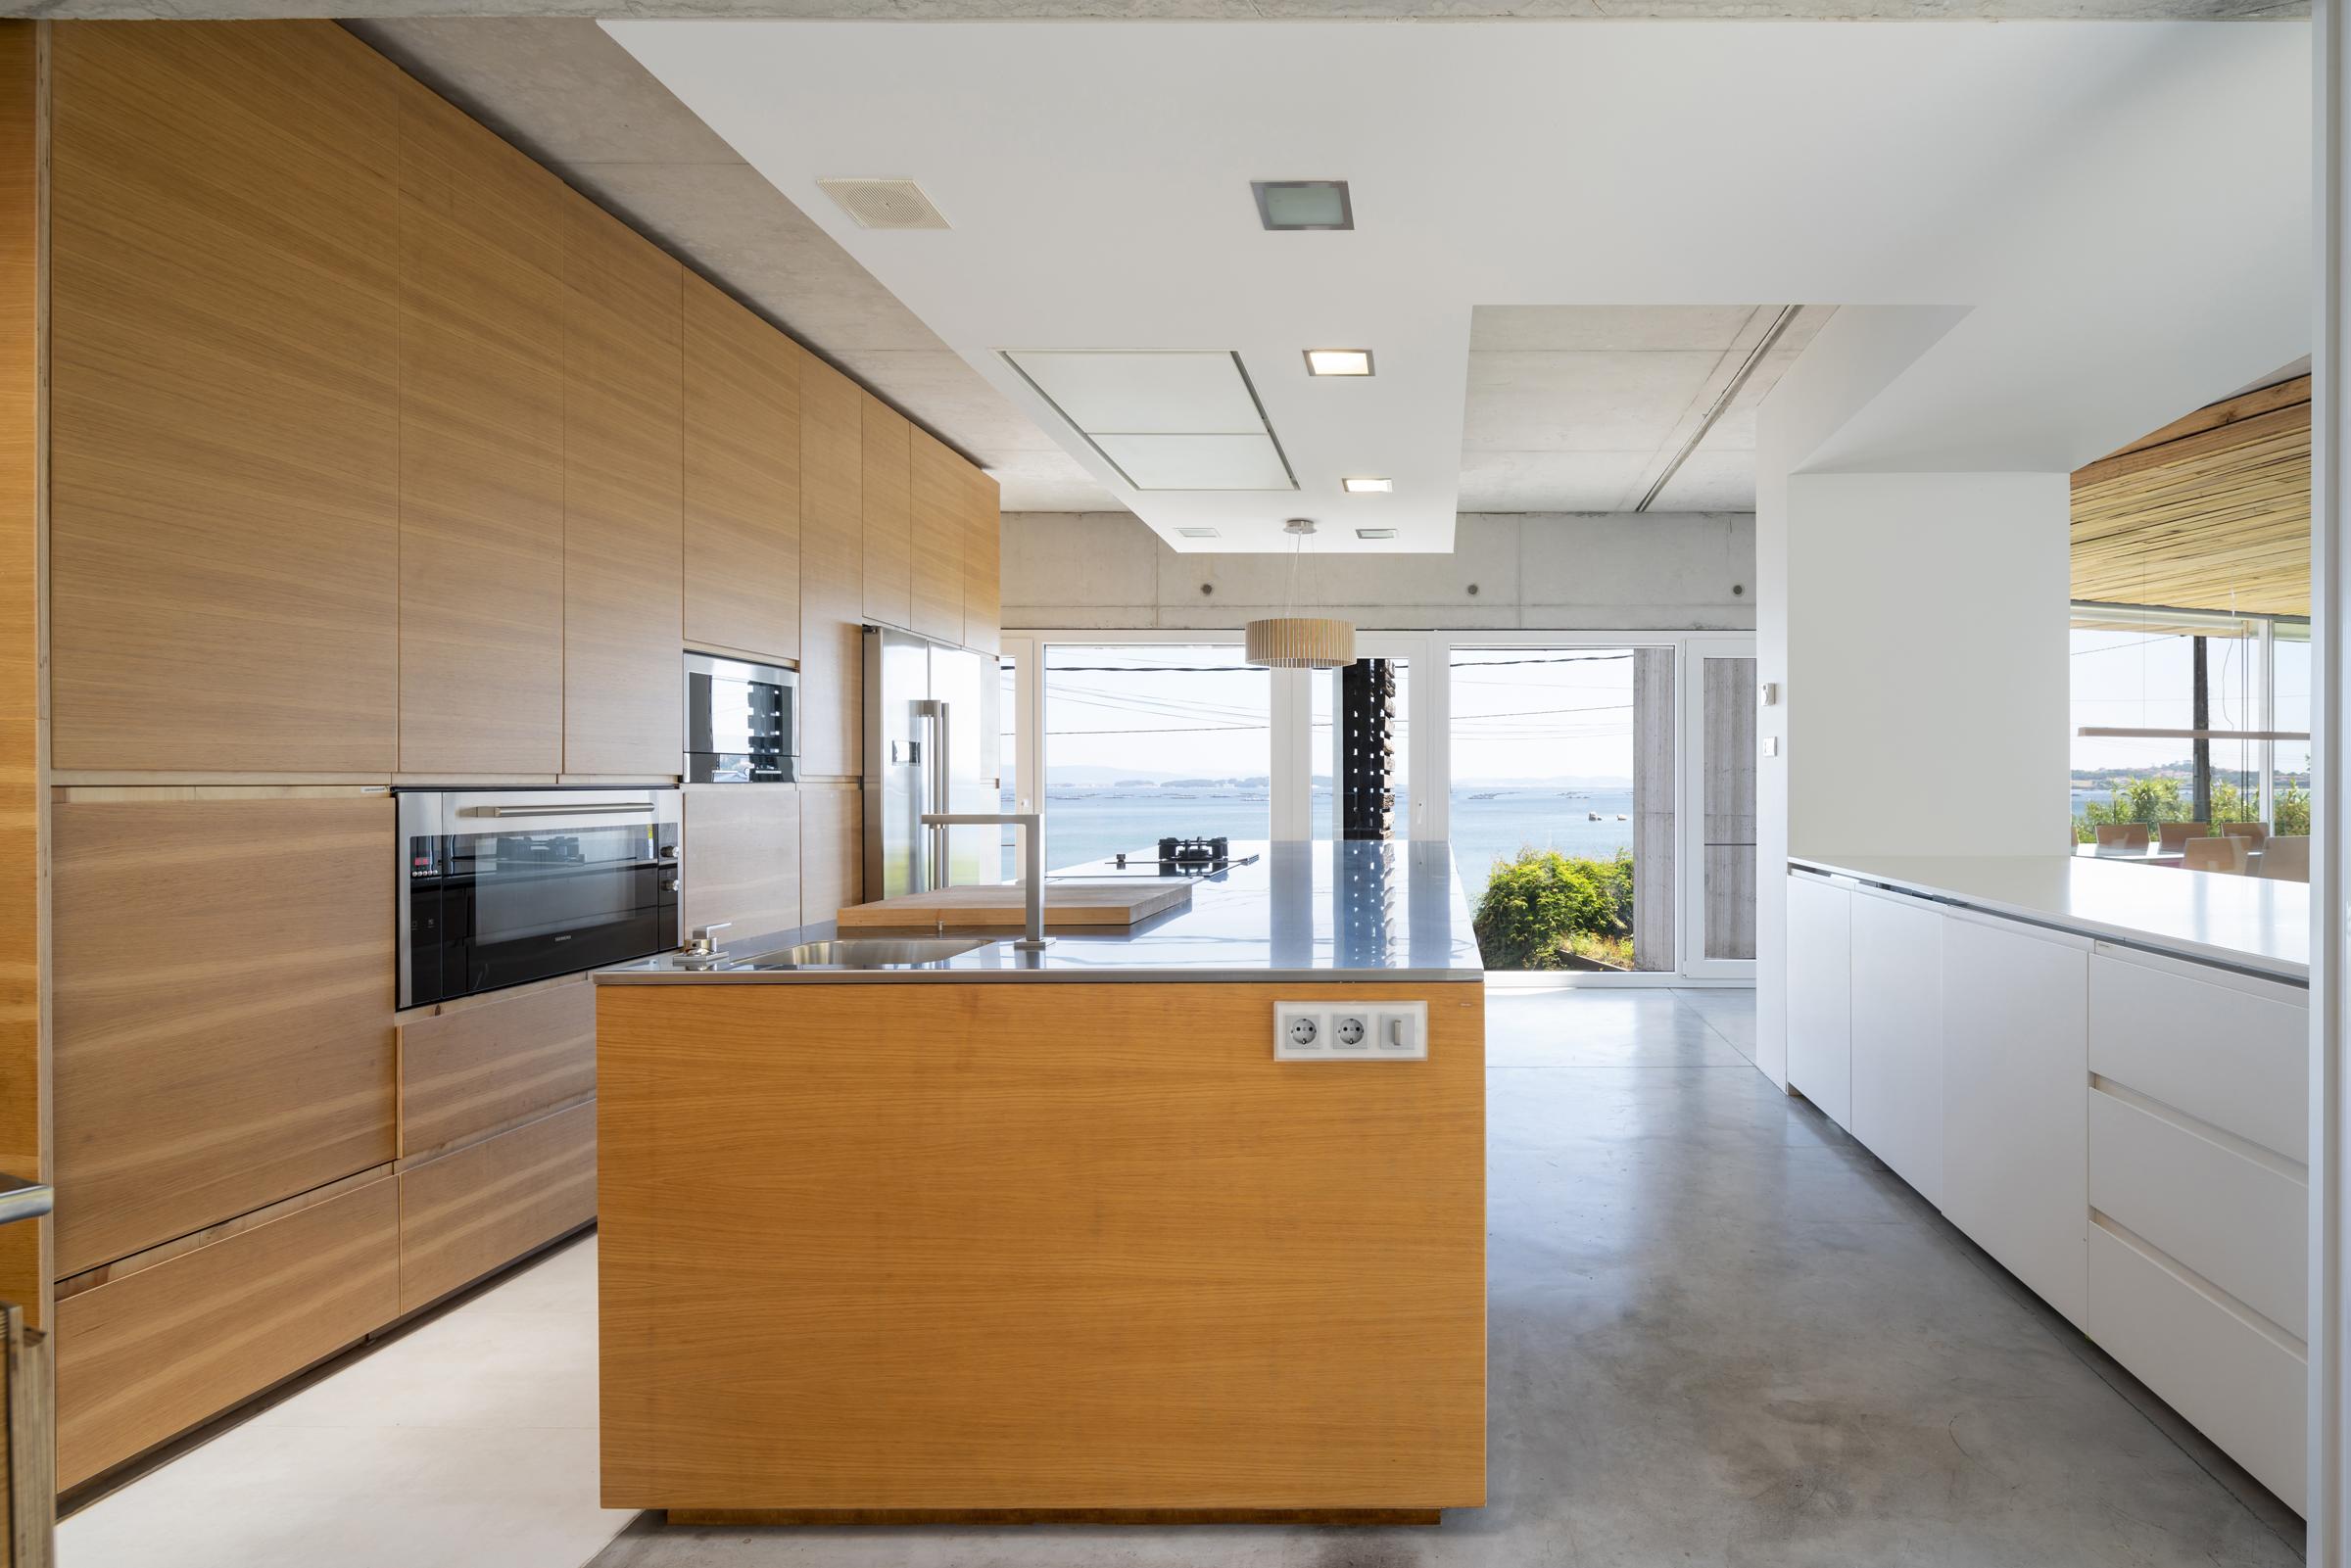 dezanove-house-luxury-villa-galicia-kitchen-1